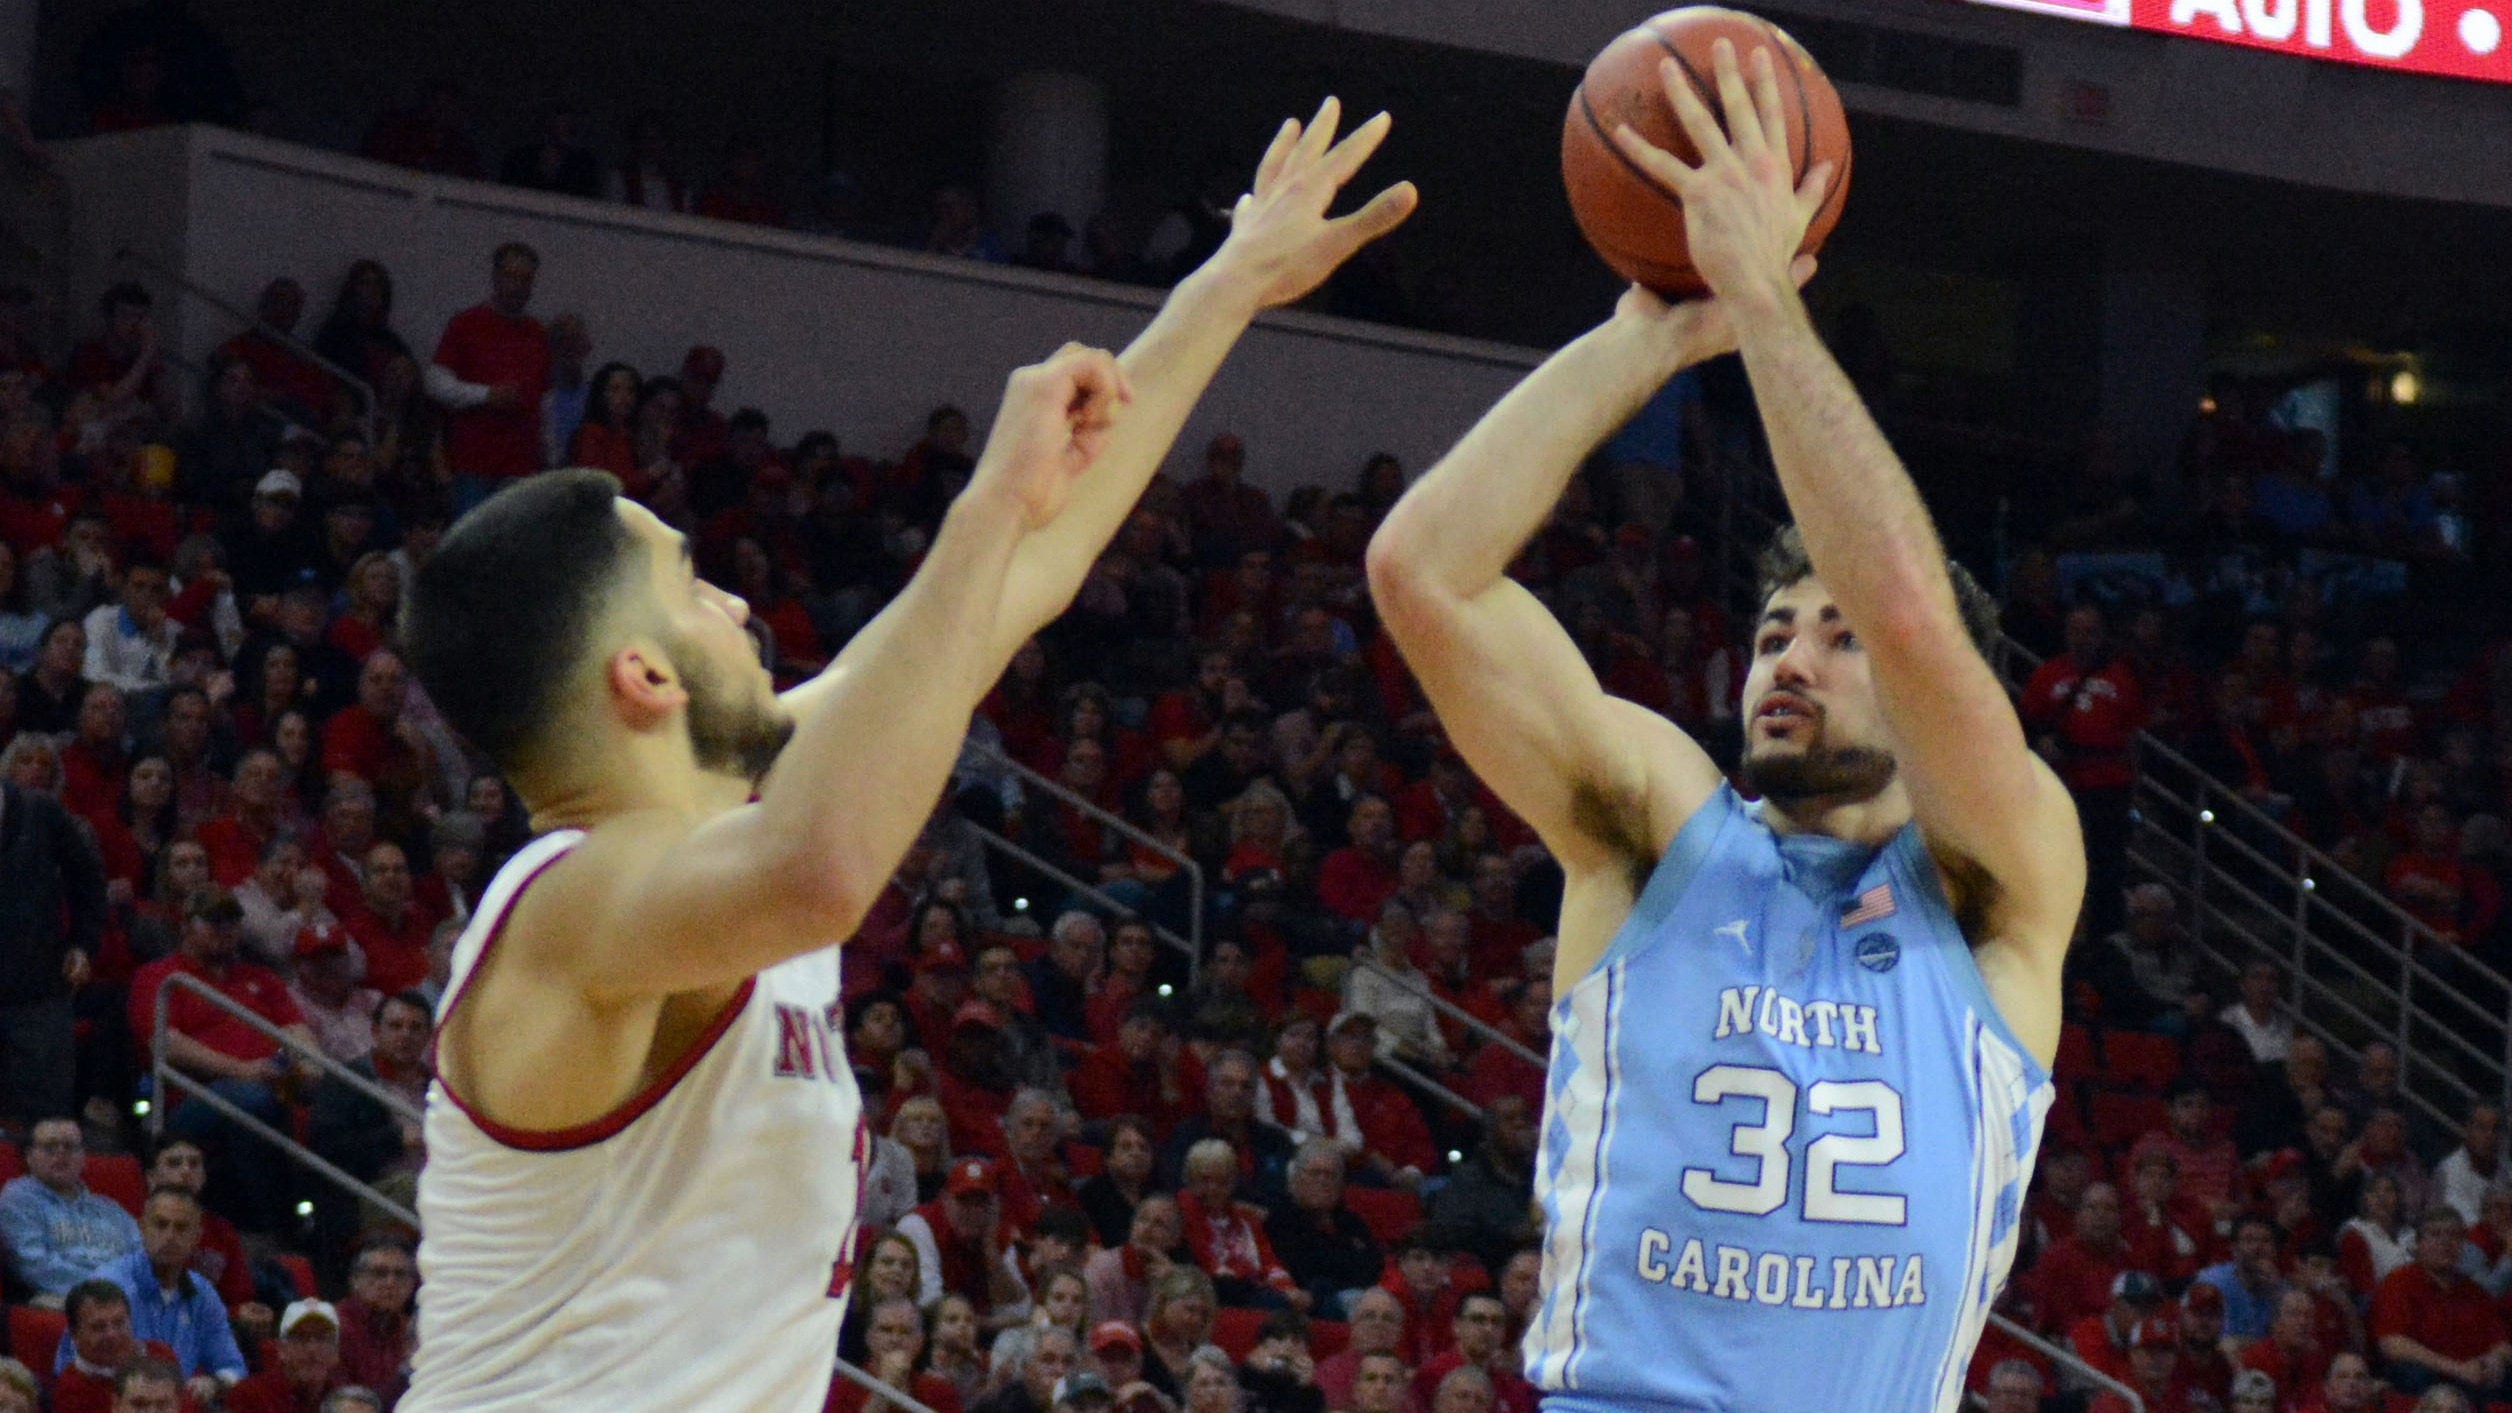 North Carolina's Luke Maye takes a jumper